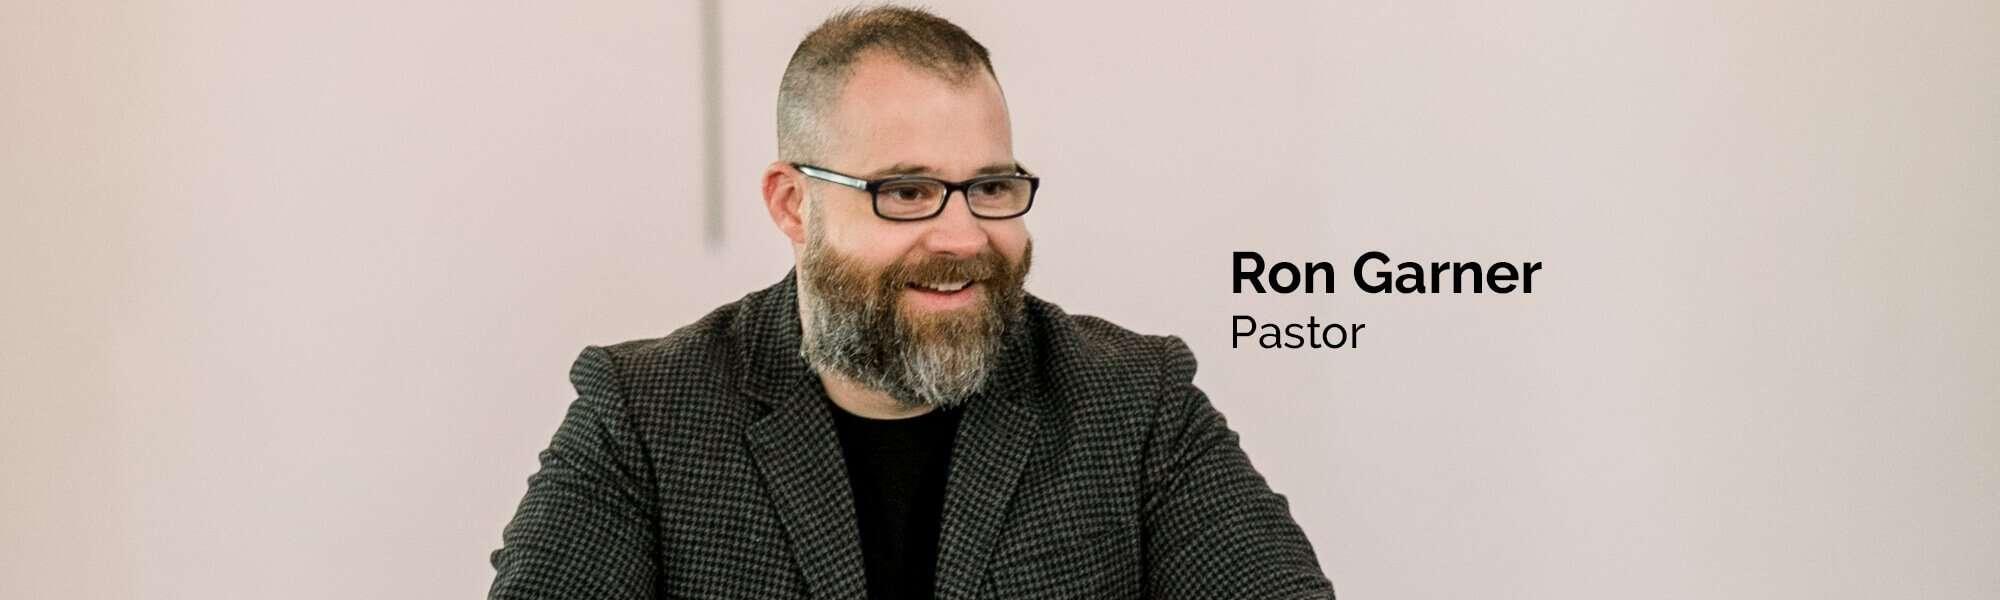 Pastor Ron Garner